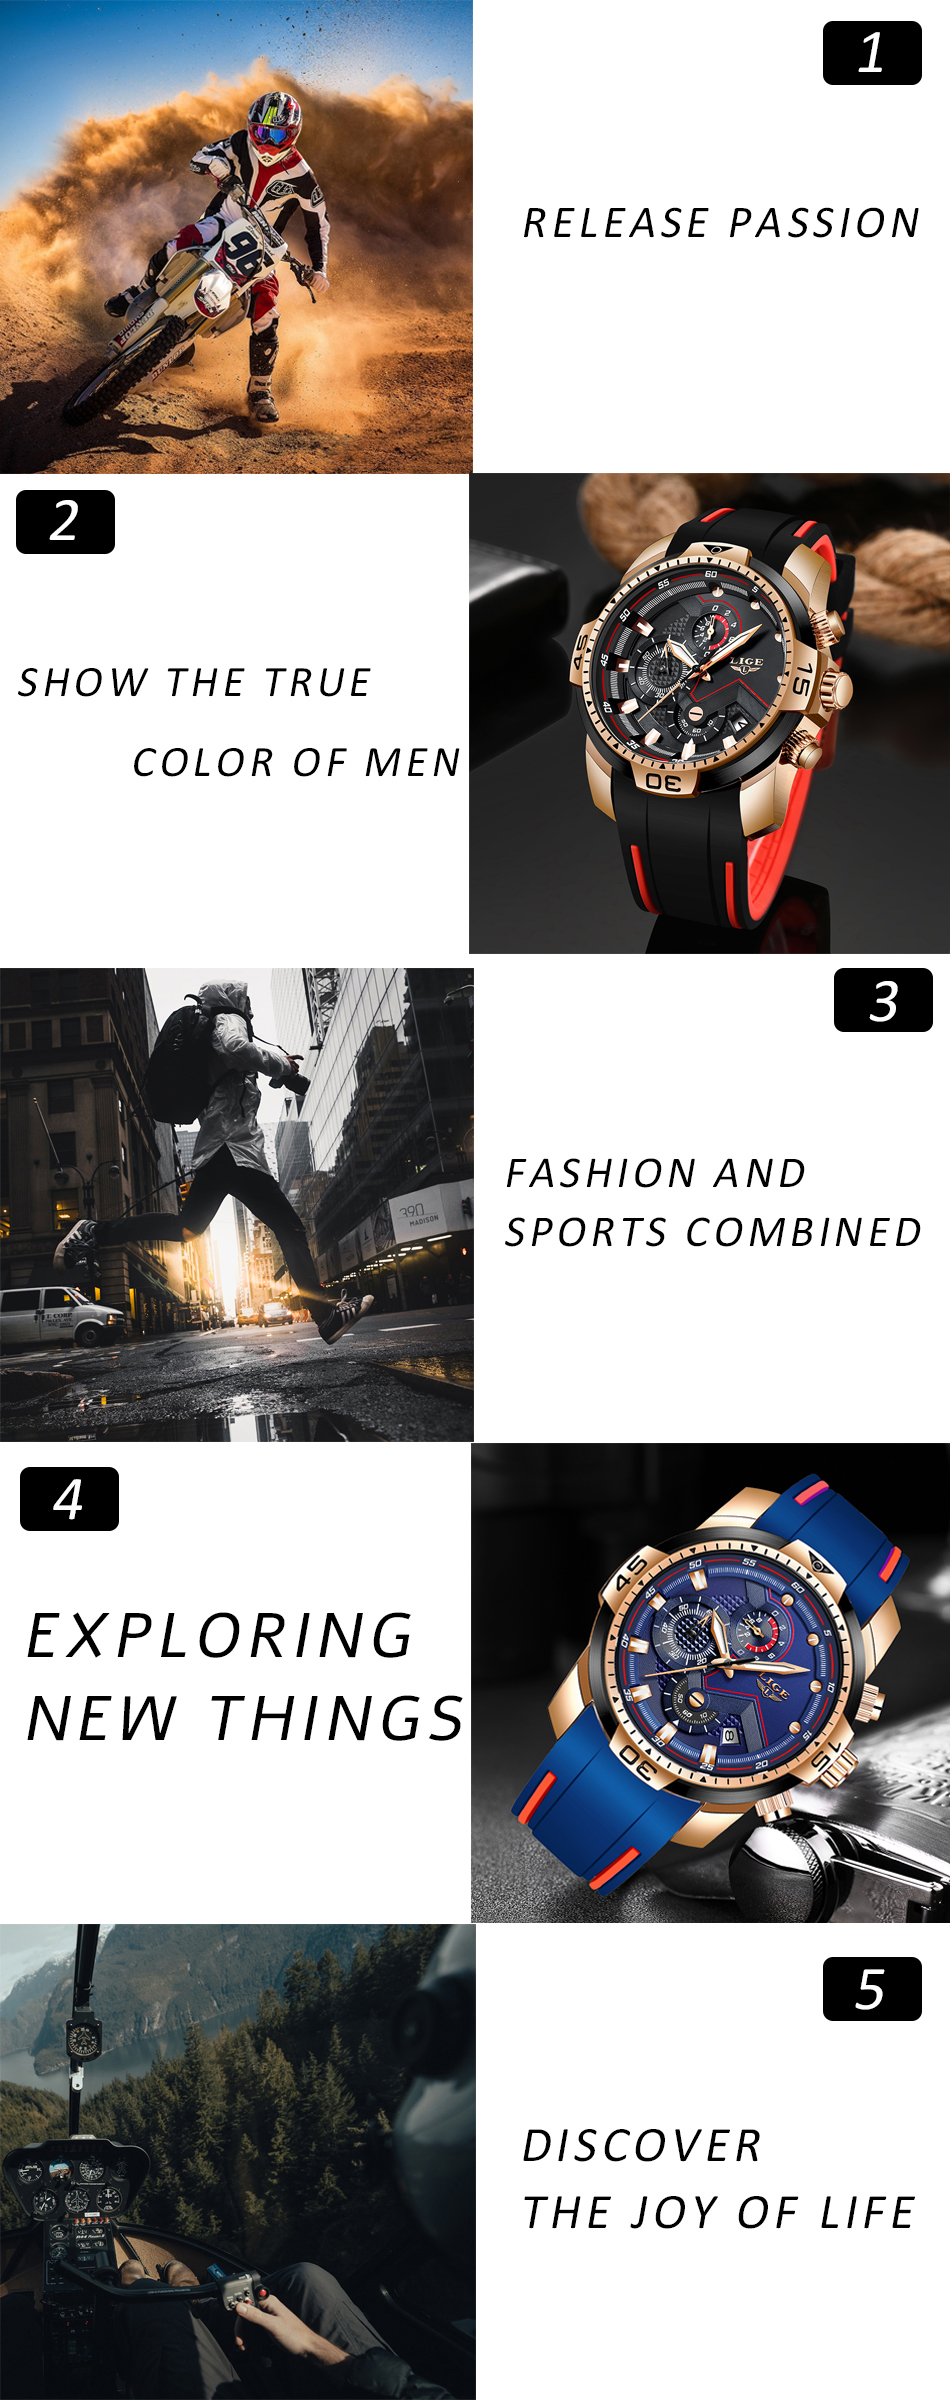 H0975281d139d4aa19e441ee3e369b916S 2020 LIGE New Mens Watches Top Luxury Brand Men Unique Sport Watch Men Quartz Date Clock Waterproof Wristwatch Relogio Masculino